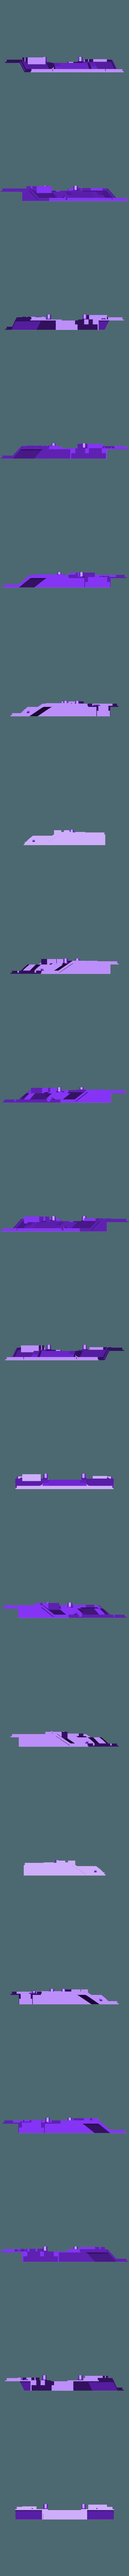 TruckV3_cab_bottom.STL Download STL file 3D Printed RC Truck V3 • 3D print model, MrCrankyface